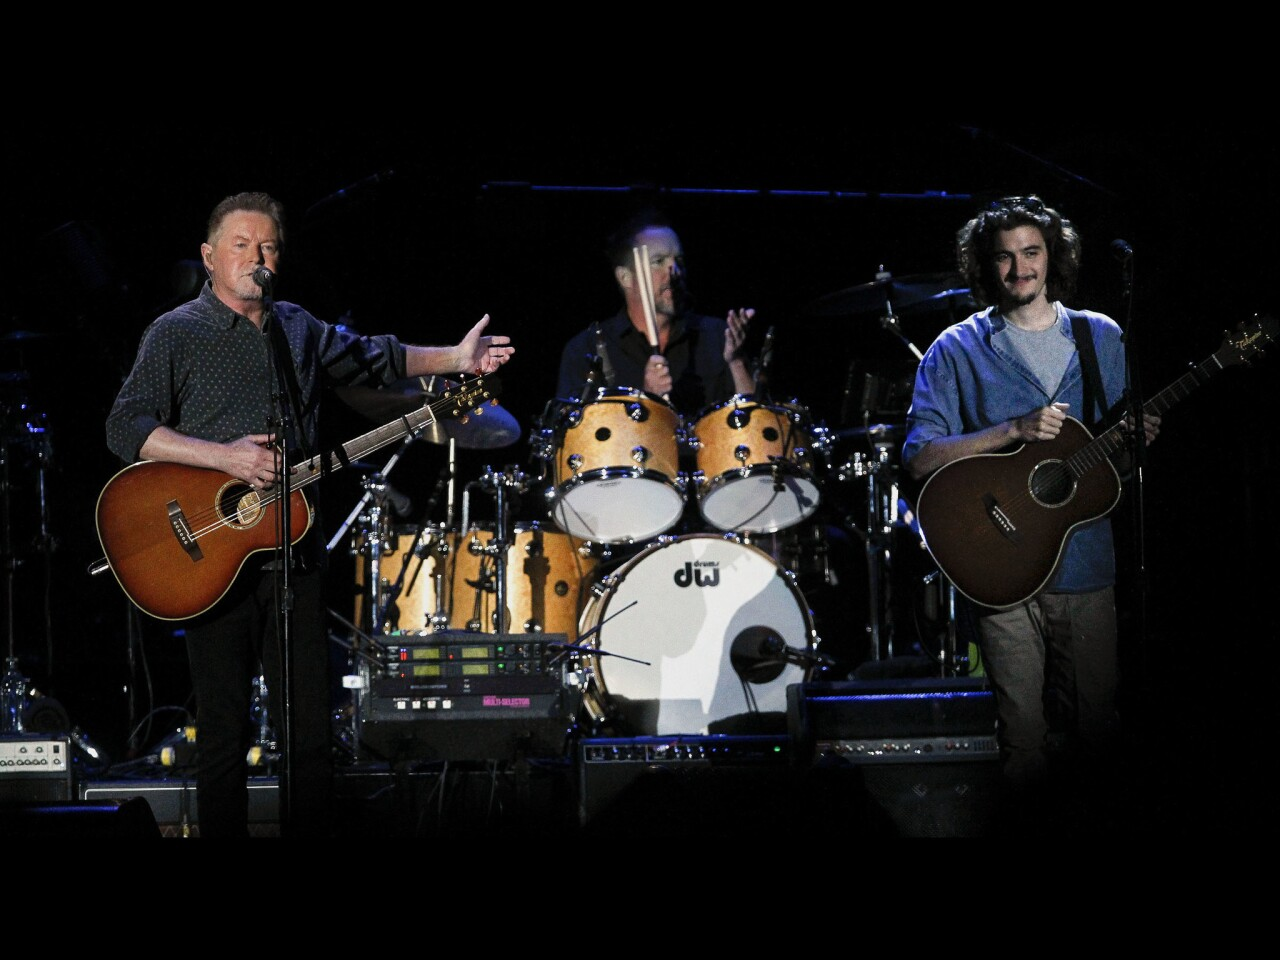 Don Henley, left, introduces Deacon Frey, son of Glenn Frey, during the Eagles concert at Petco Park.